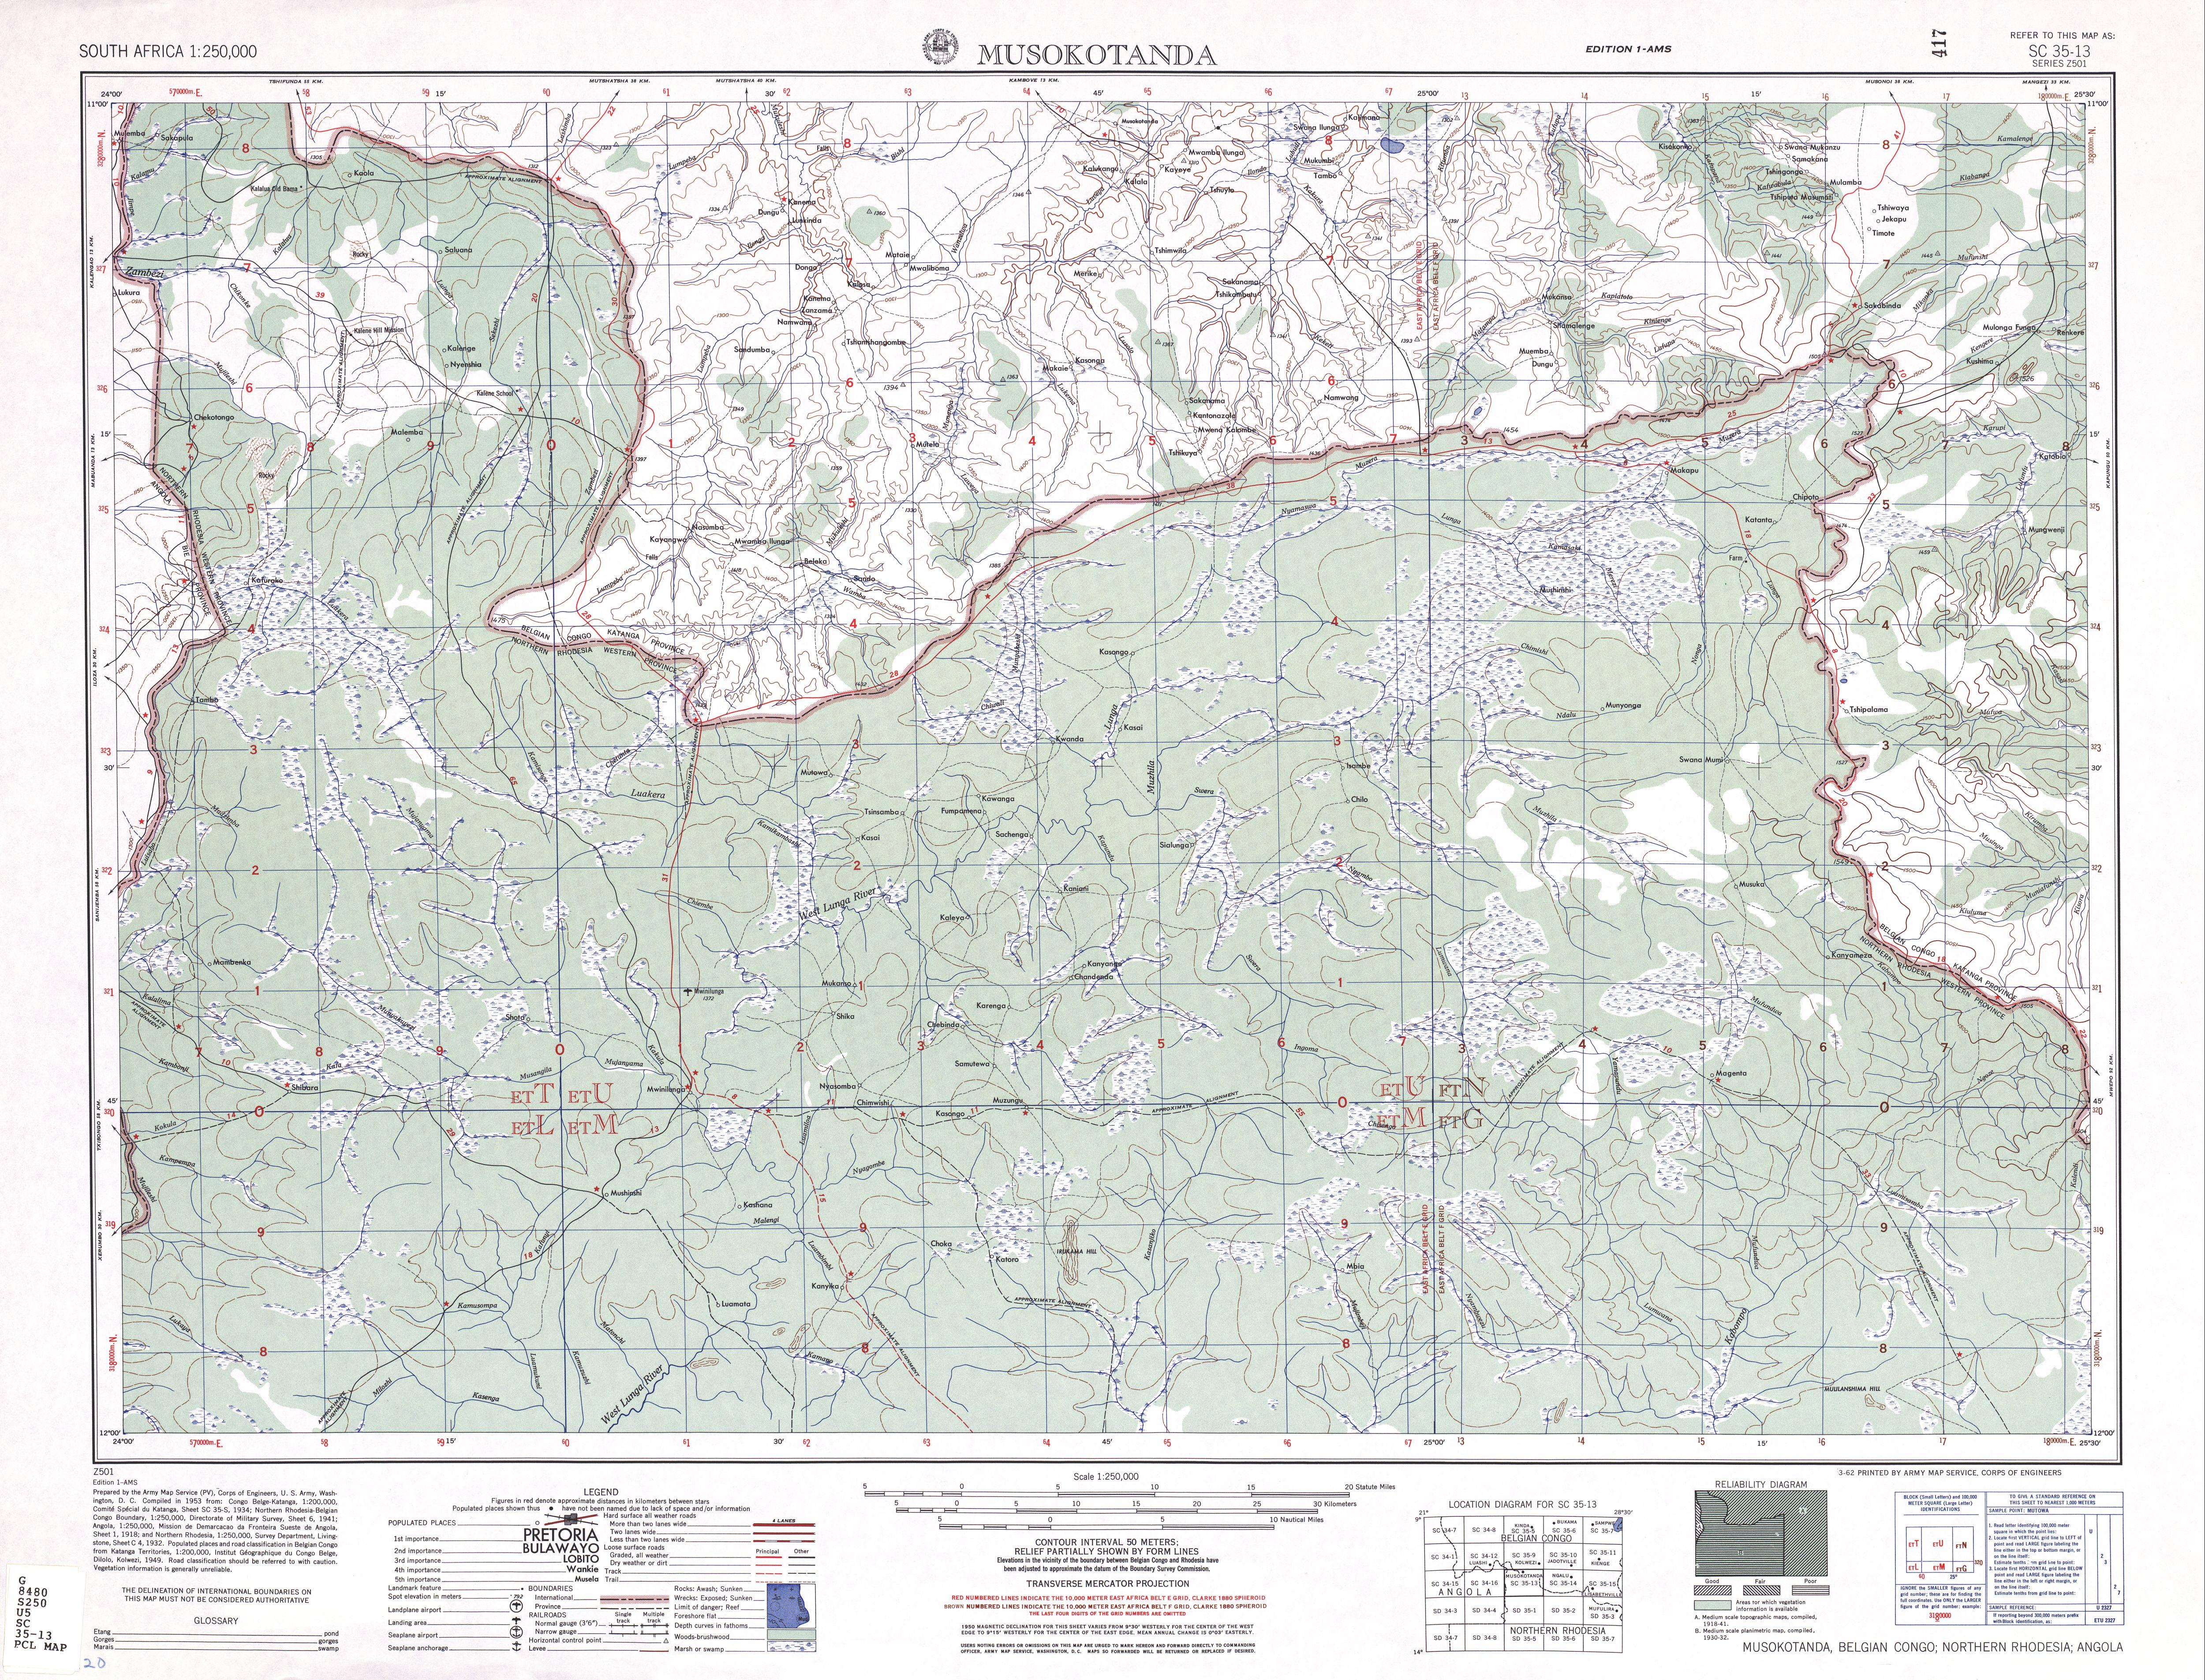 Musokotanda Topographic Map Sheet, Southern Africa 1954